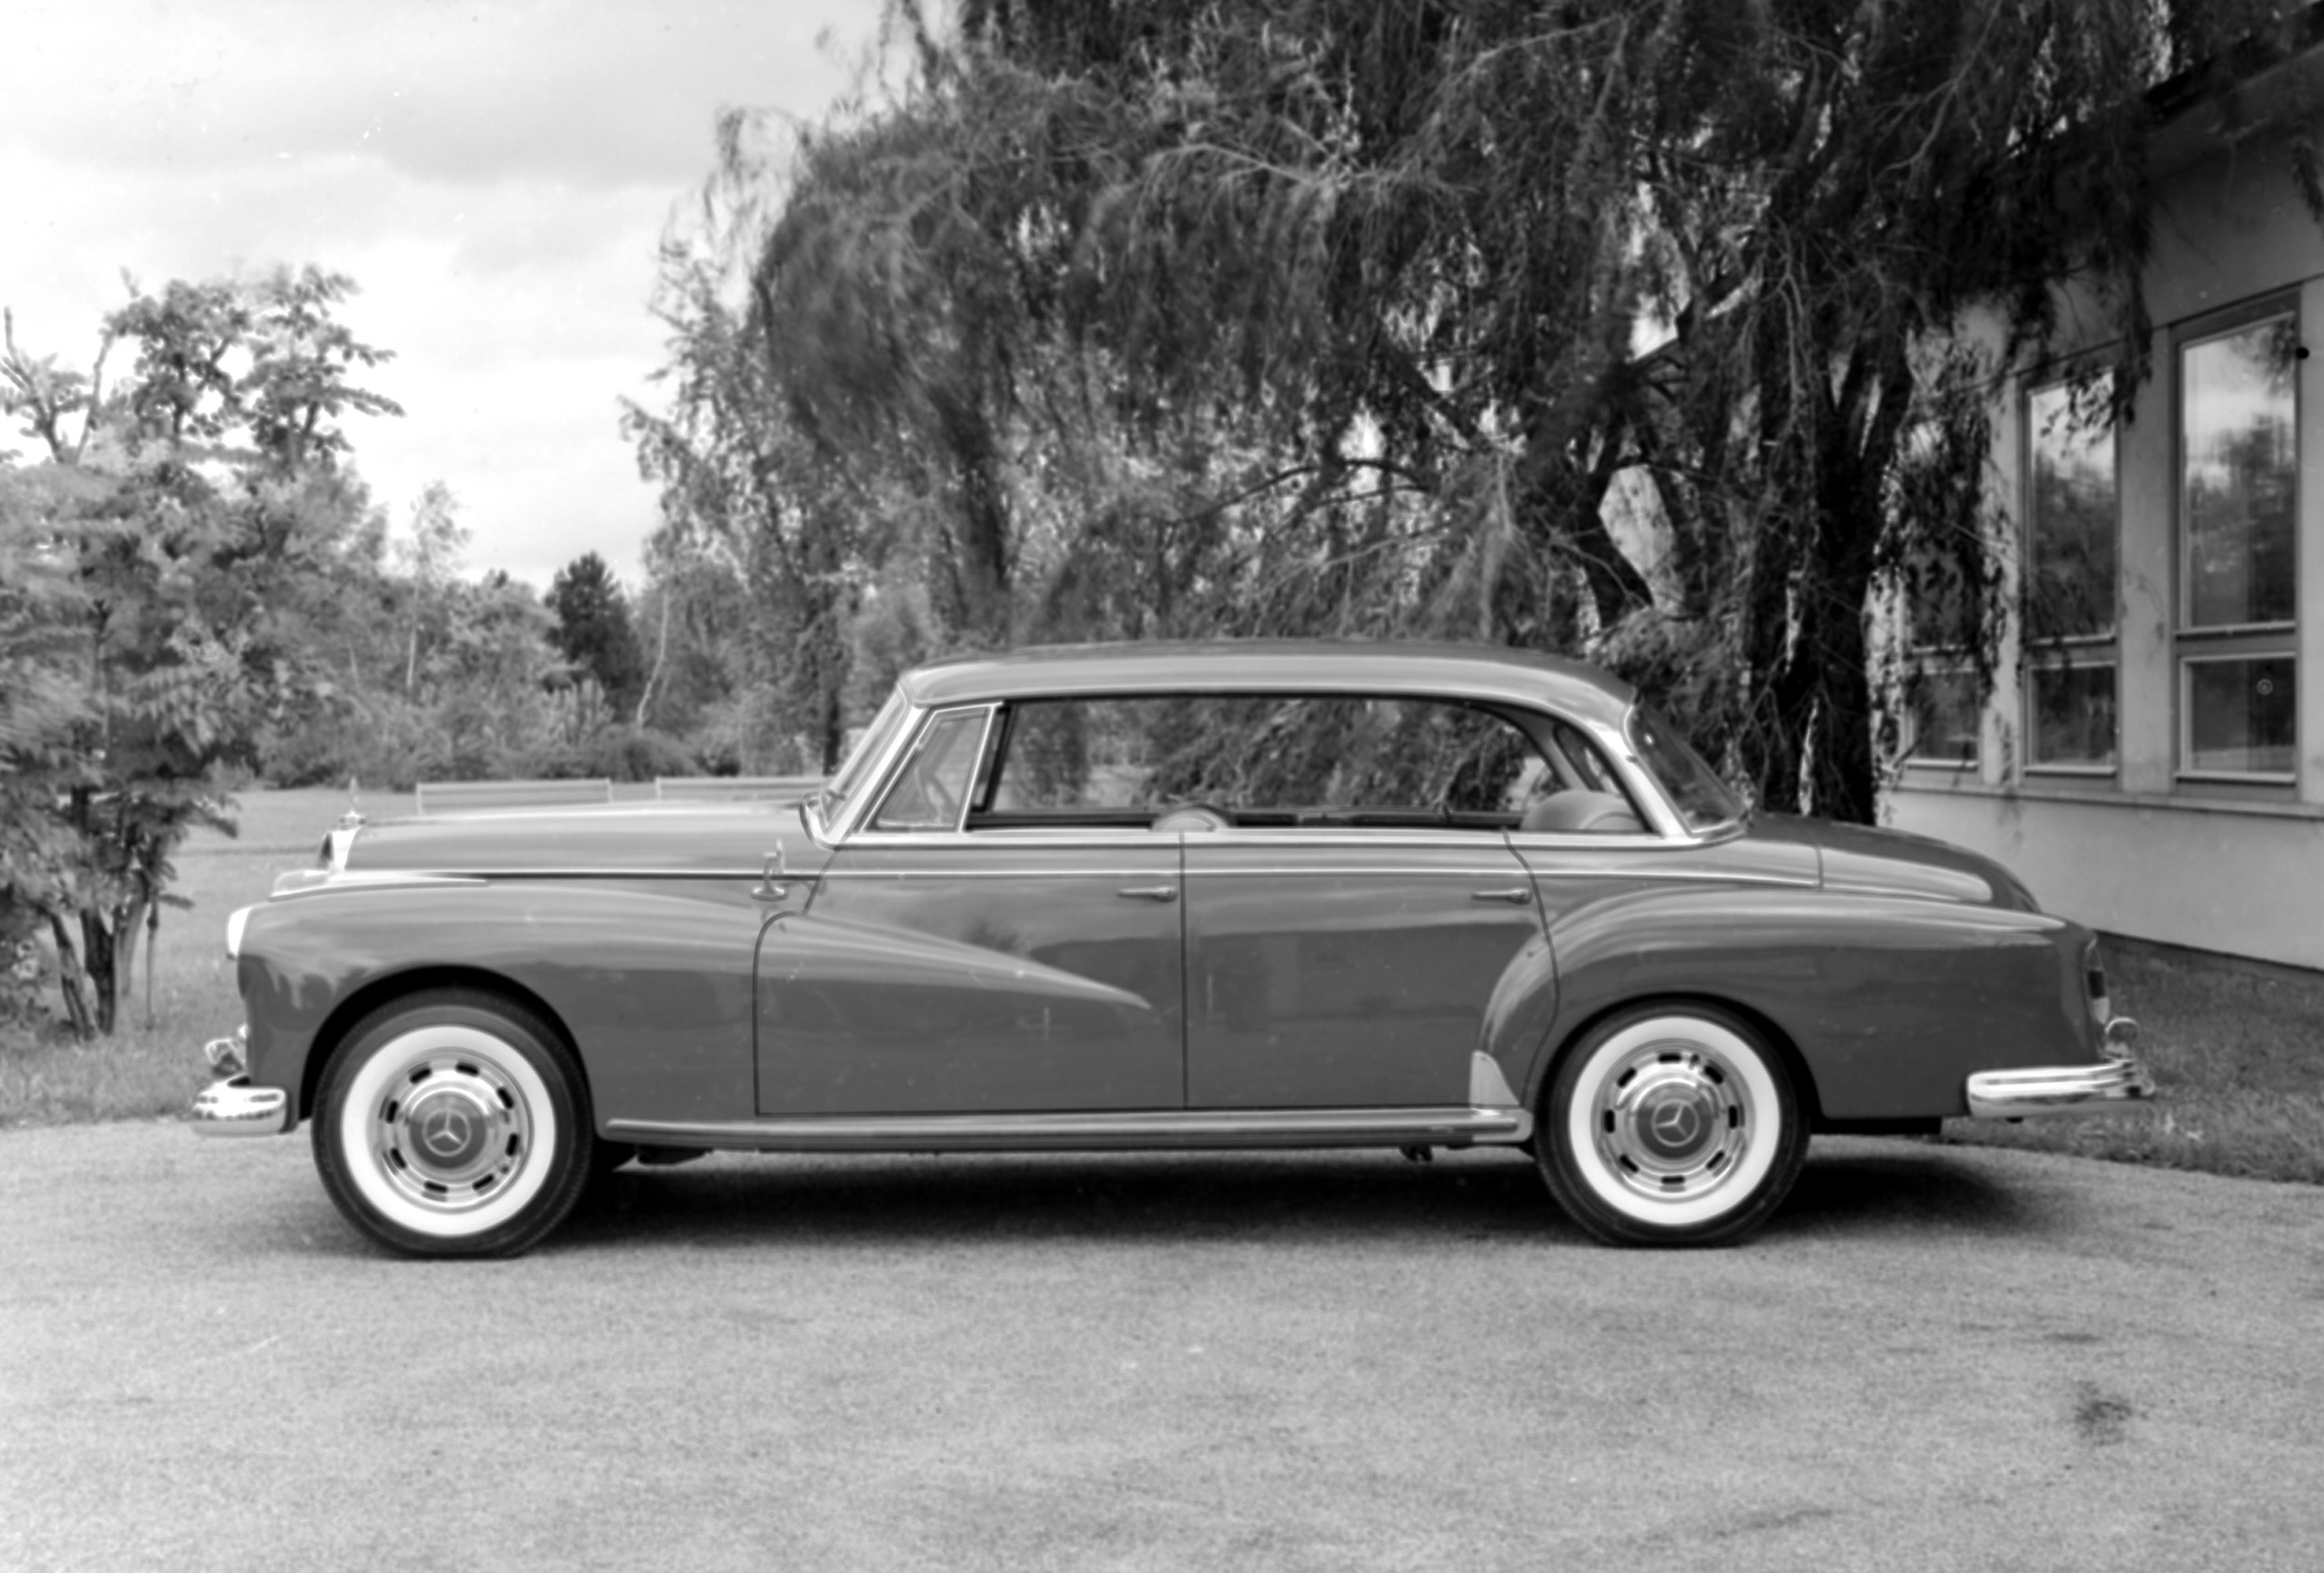 1959 mercedes benz 300d picture 94628 for Mercedes benz 300d